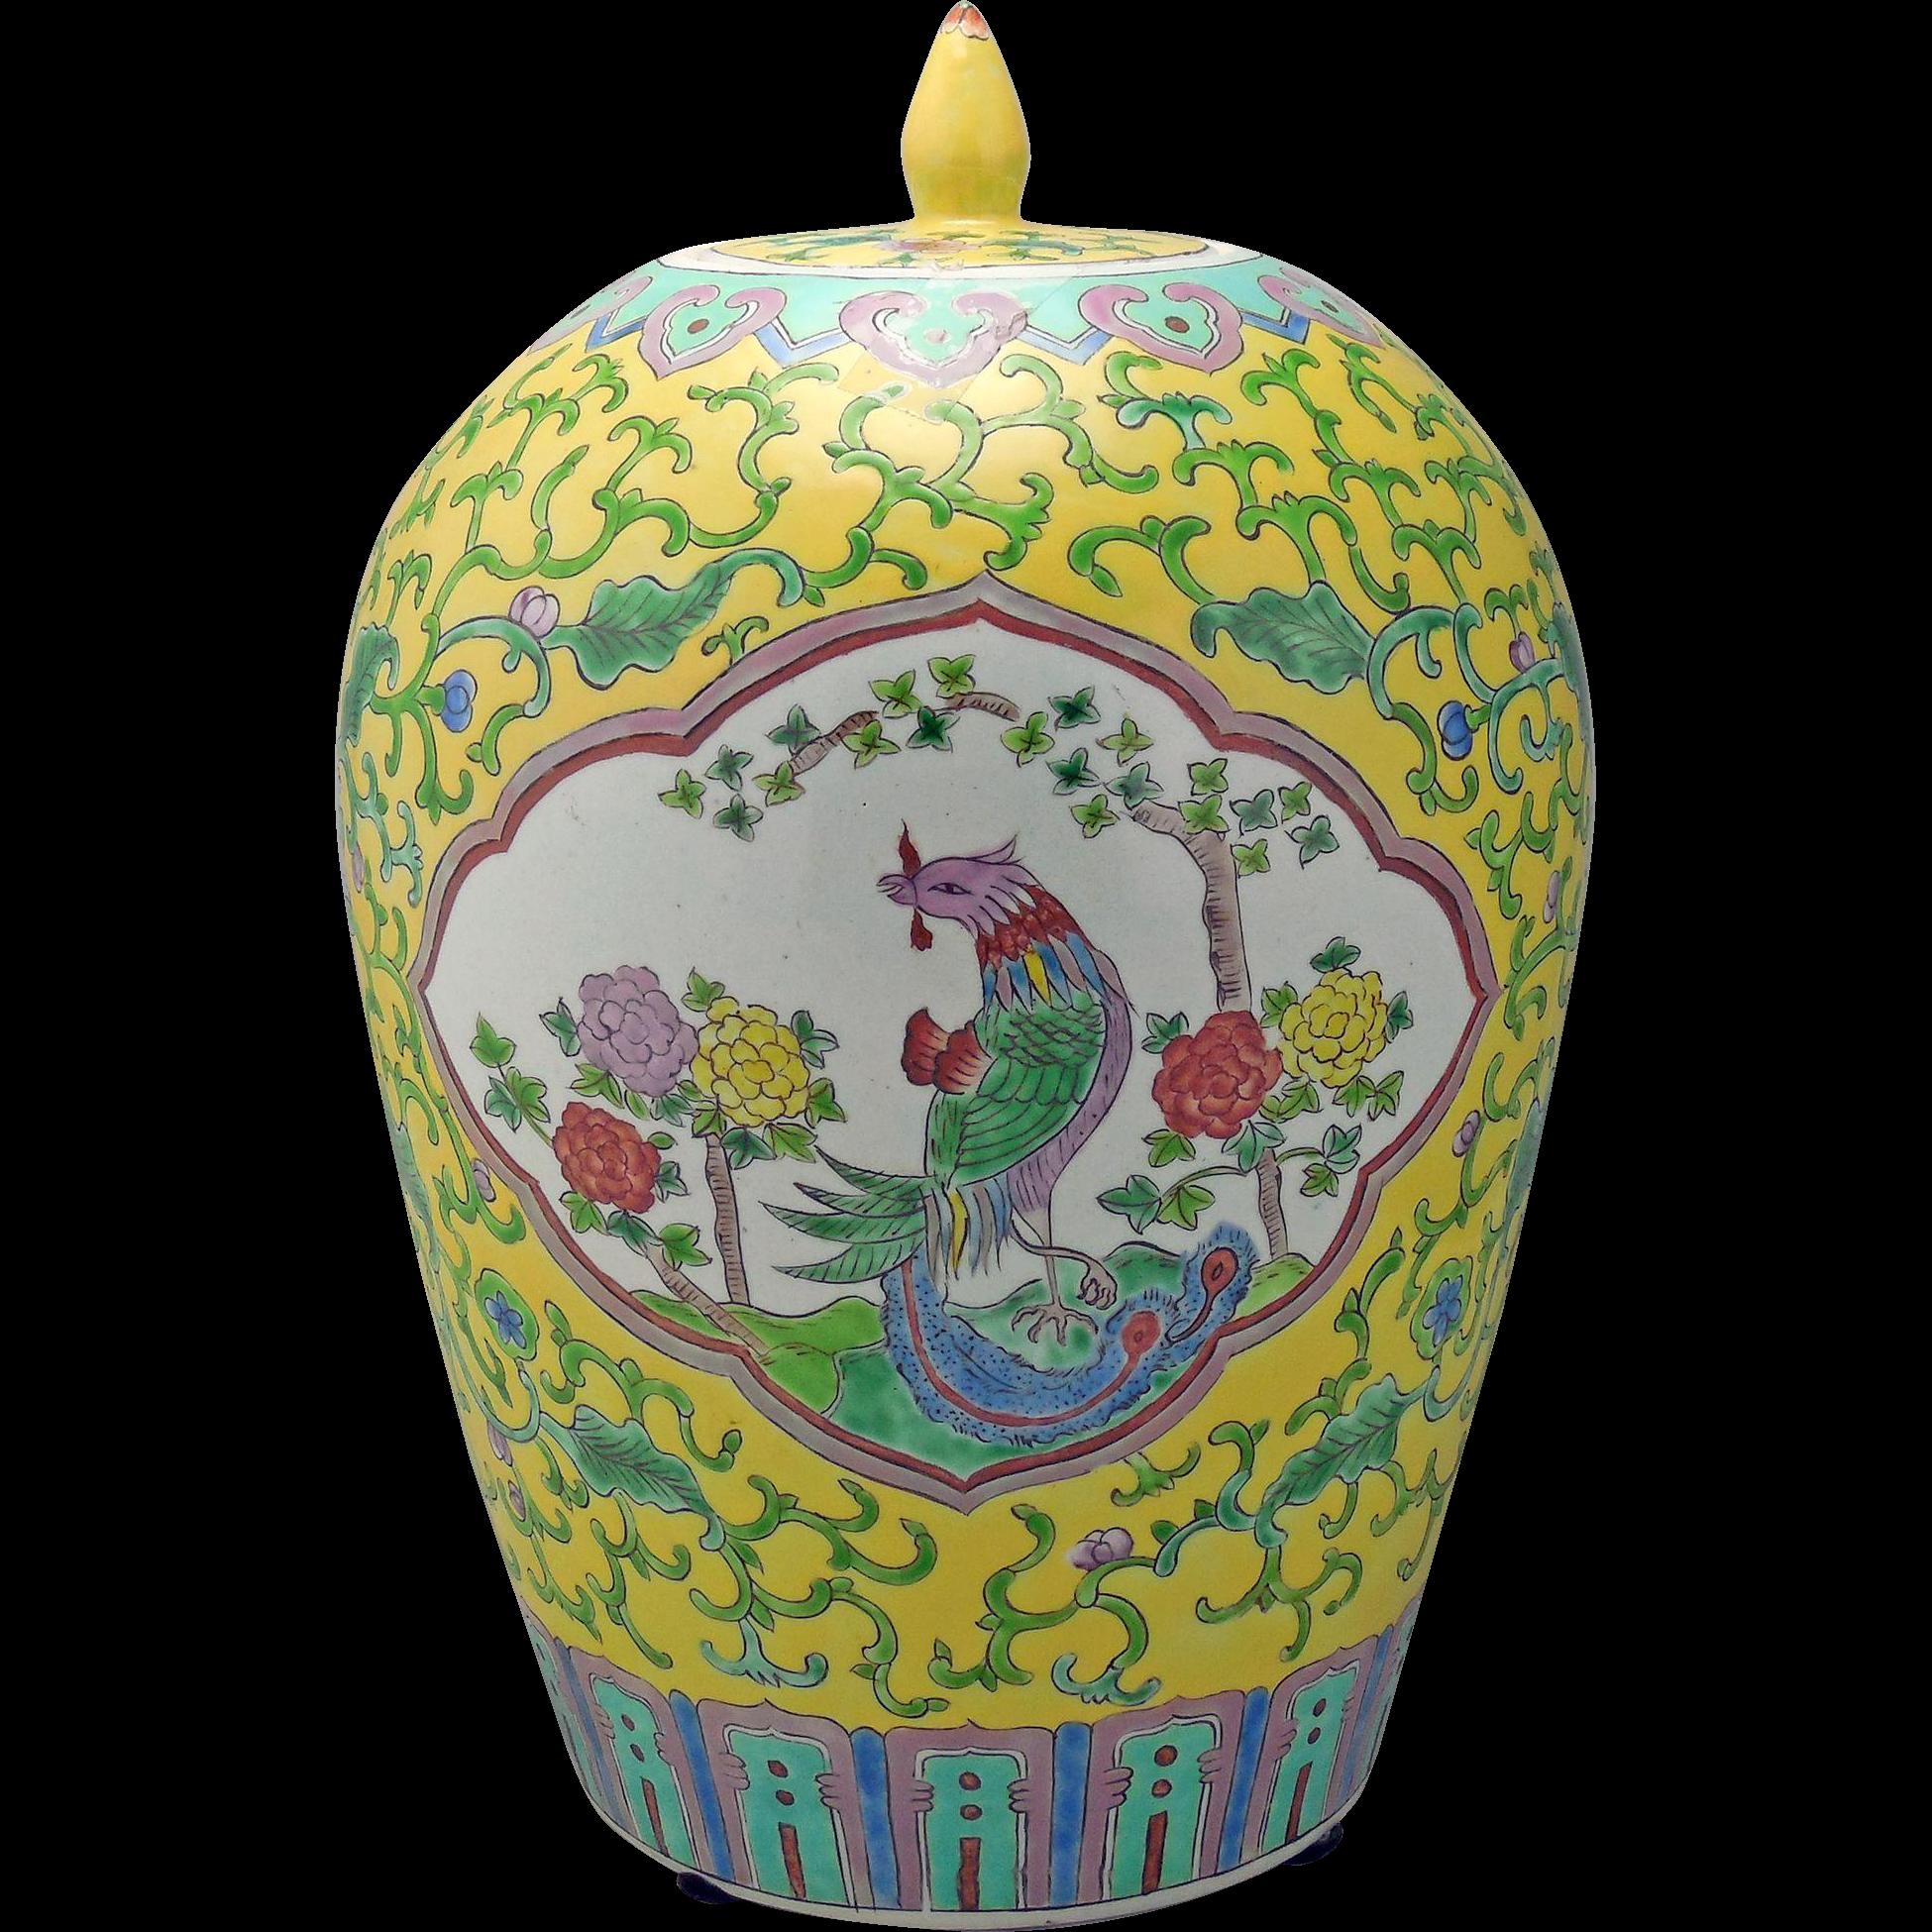 Vintage Chinese Porcelain Melon Jar Vase with Lid - Birds and Flowers